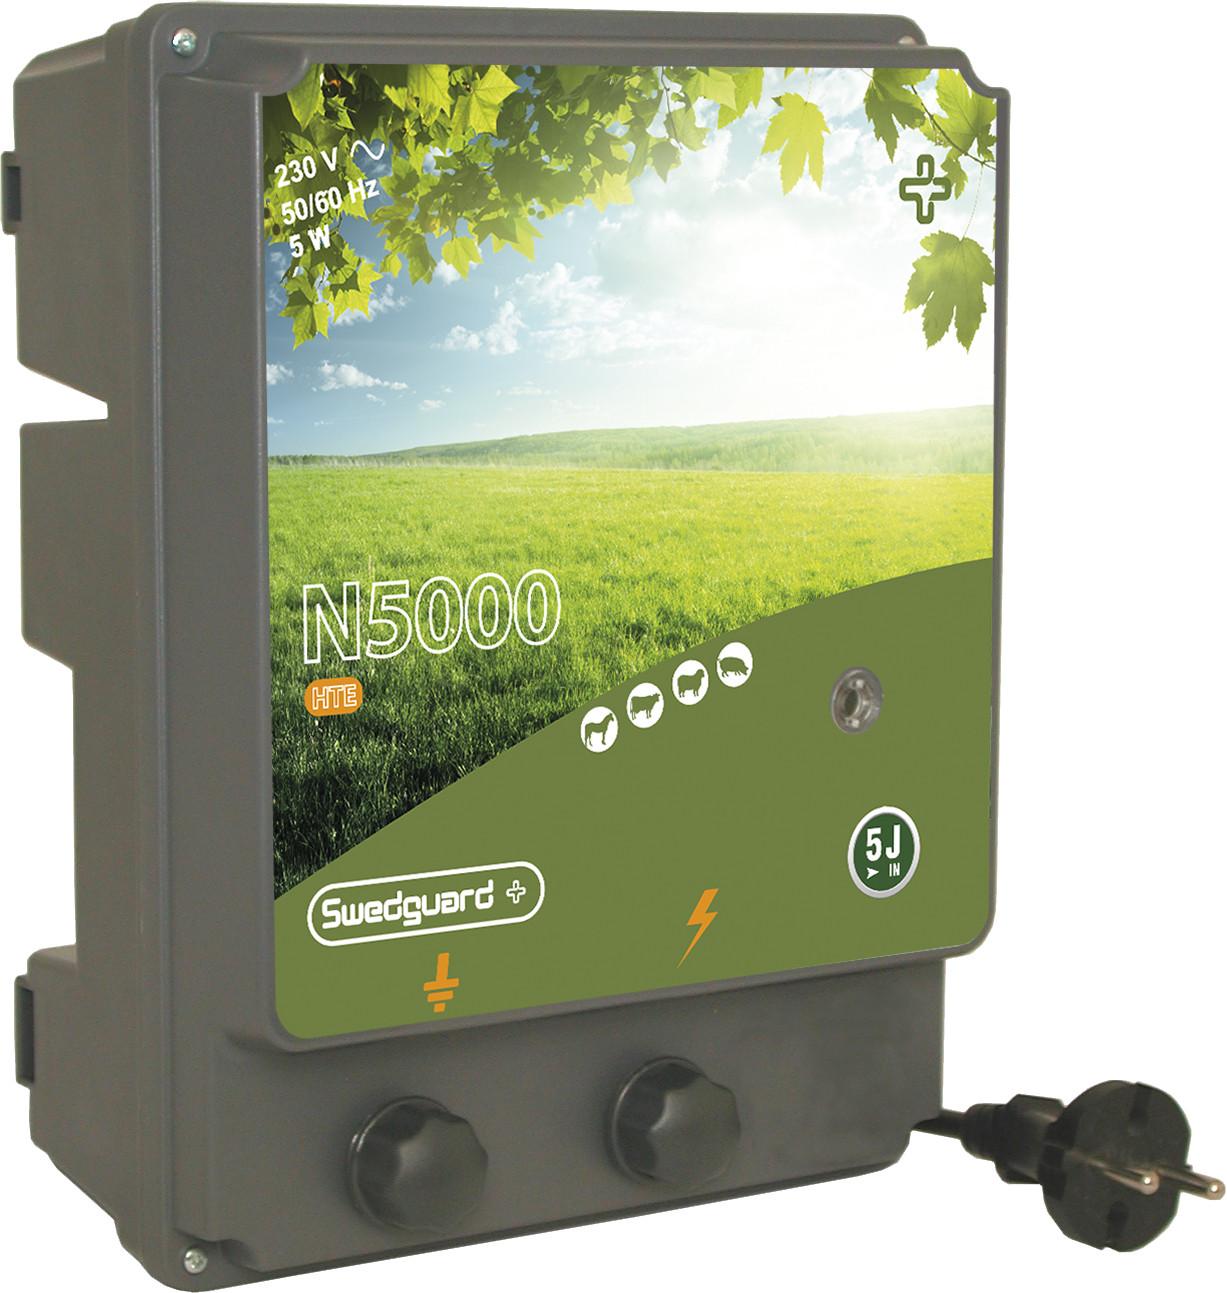 Aggregat Swedguard N5000